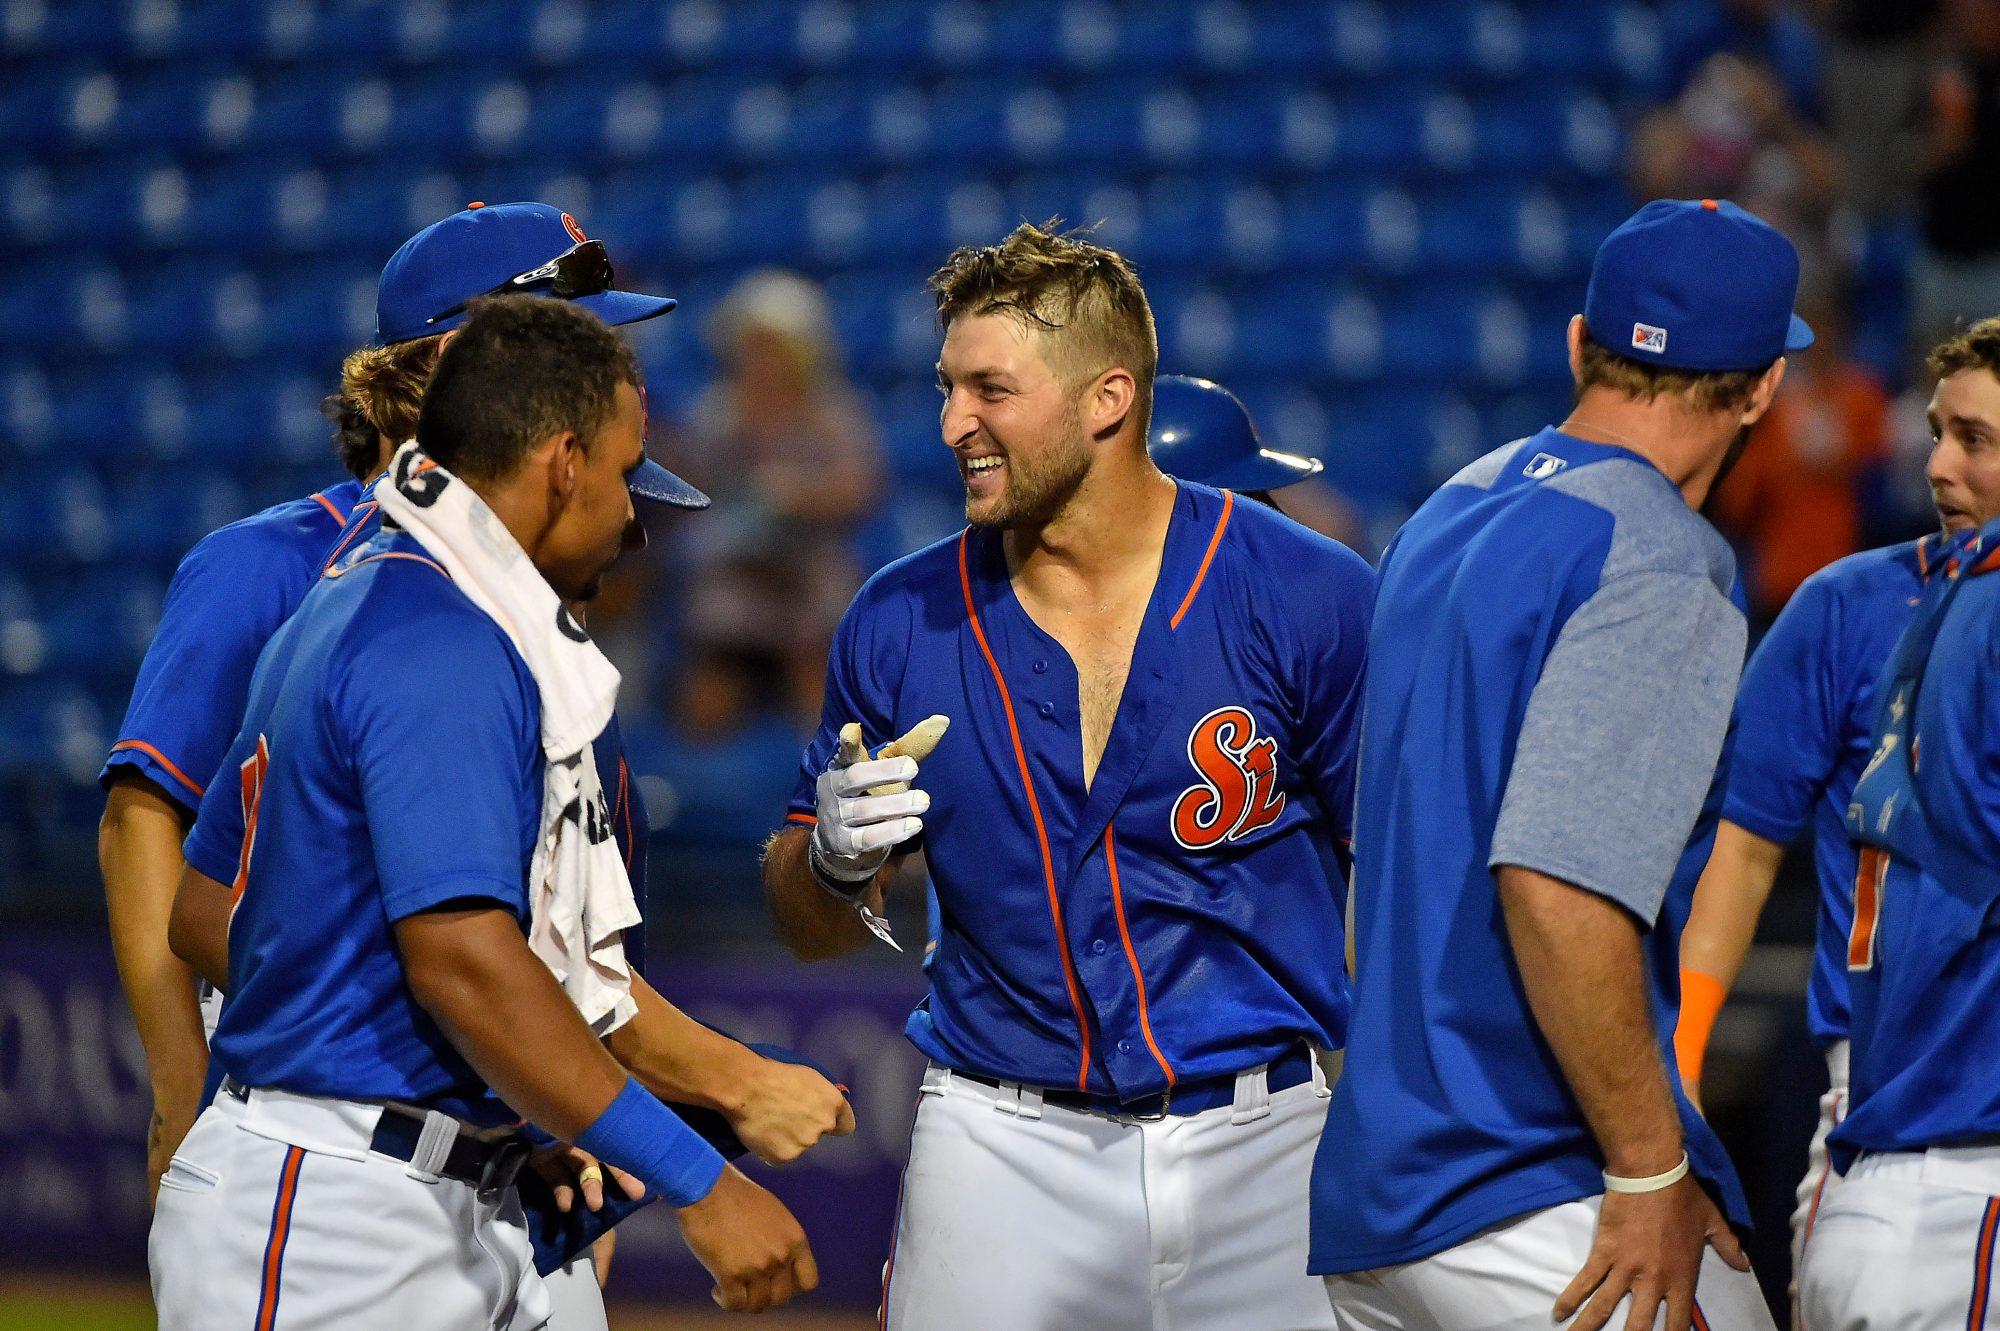 New York Mets: Tim Tebow Blasts Walk-Off Solo Shot